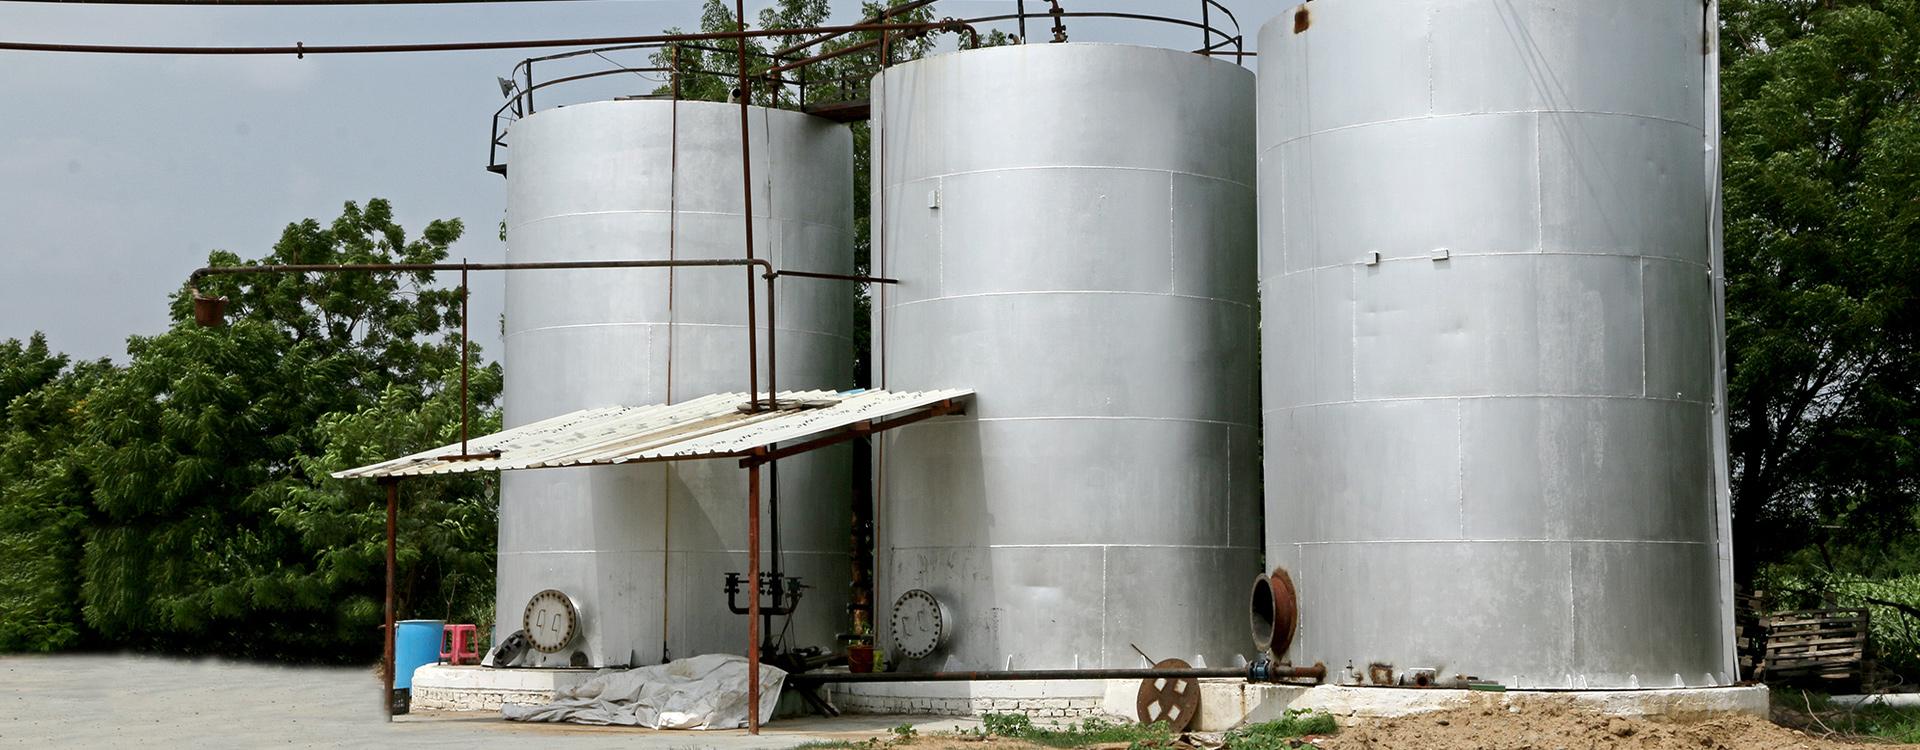 Peanut Oil Supplier in China,Botswana,Oman